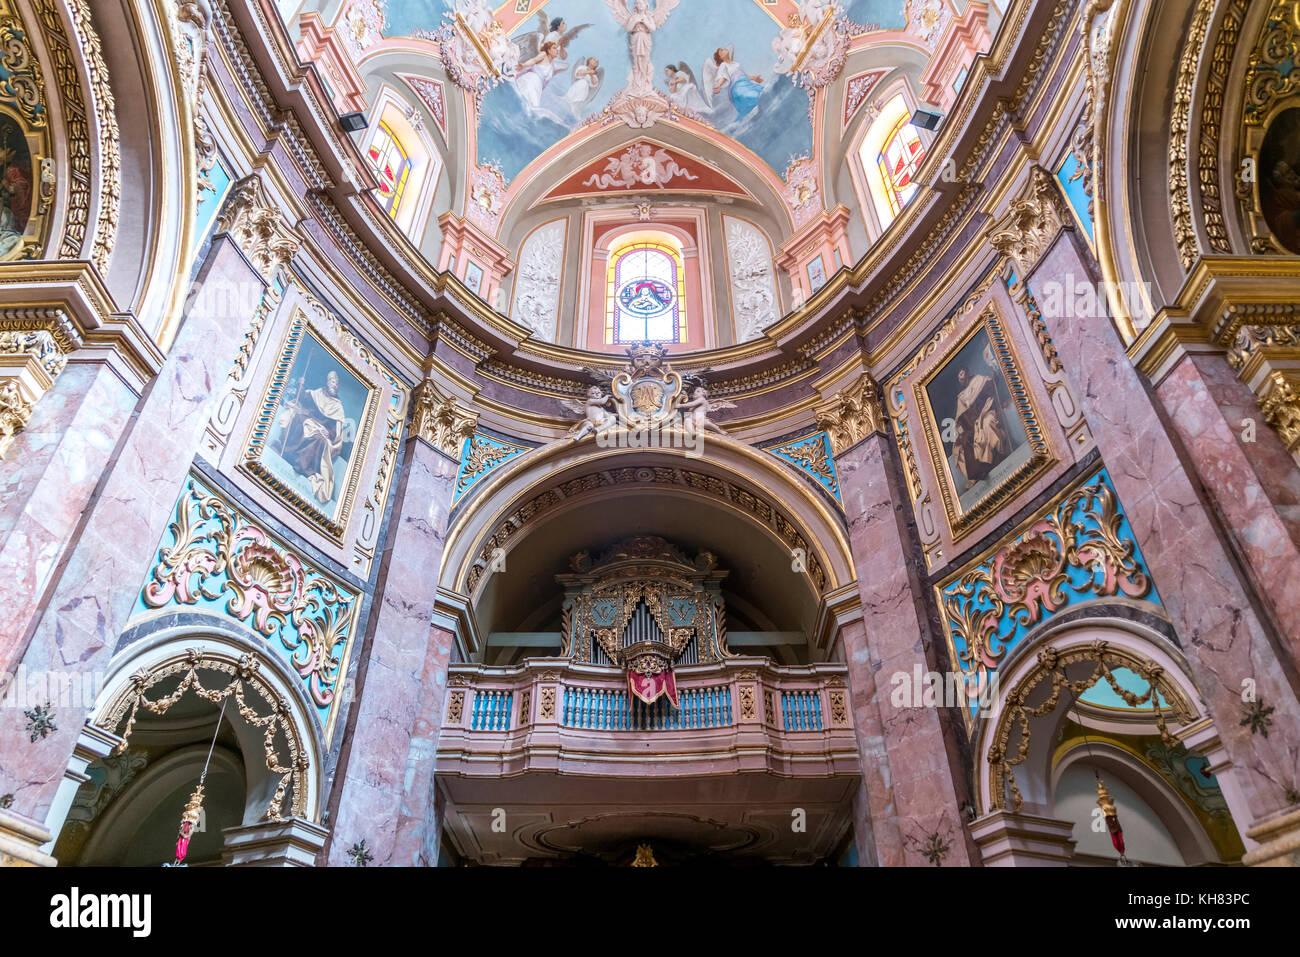 Innenraum in der Karmeliterkirche,  Mdina, Malta    Interior, Carmelite church, Mdina, Malta, Europe - Stock Image